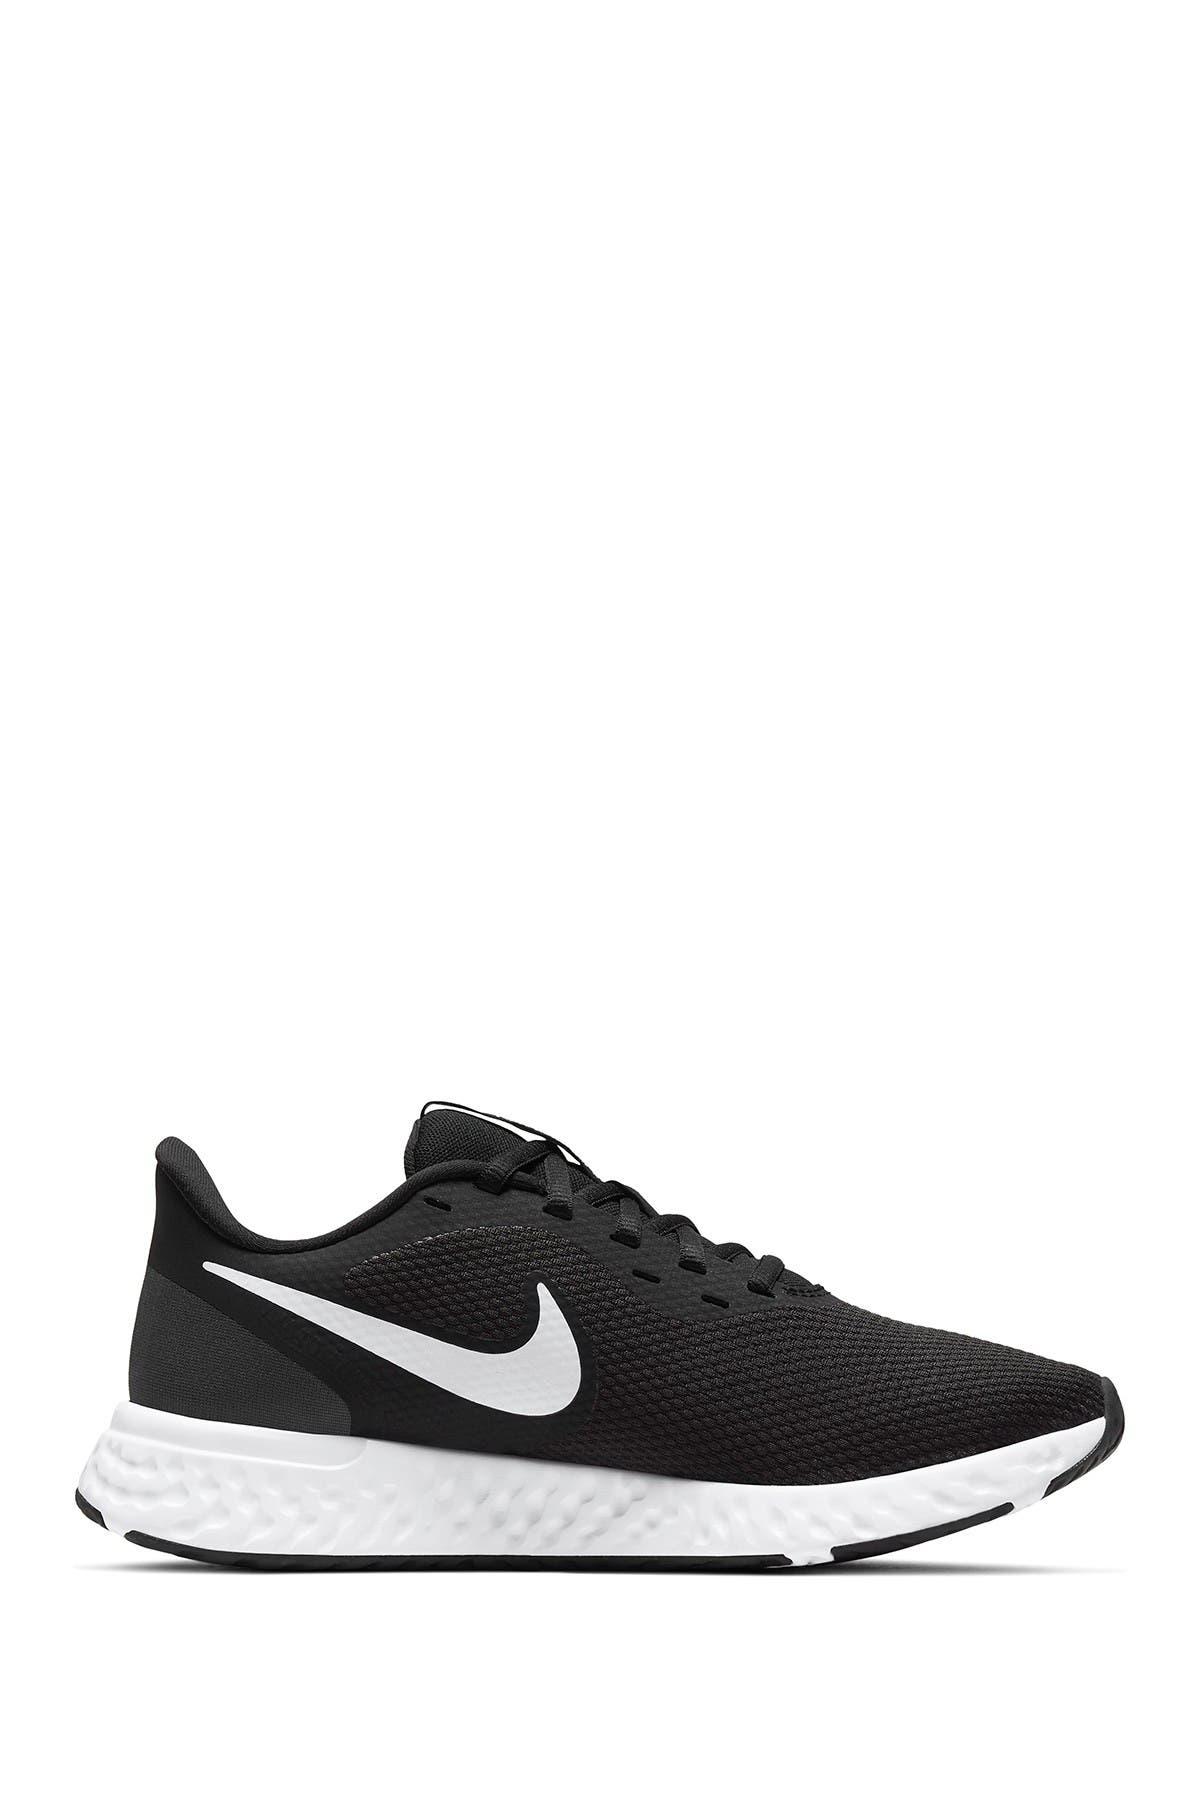 Image of Nike Revolution 5 Running Shoe - Wide Width